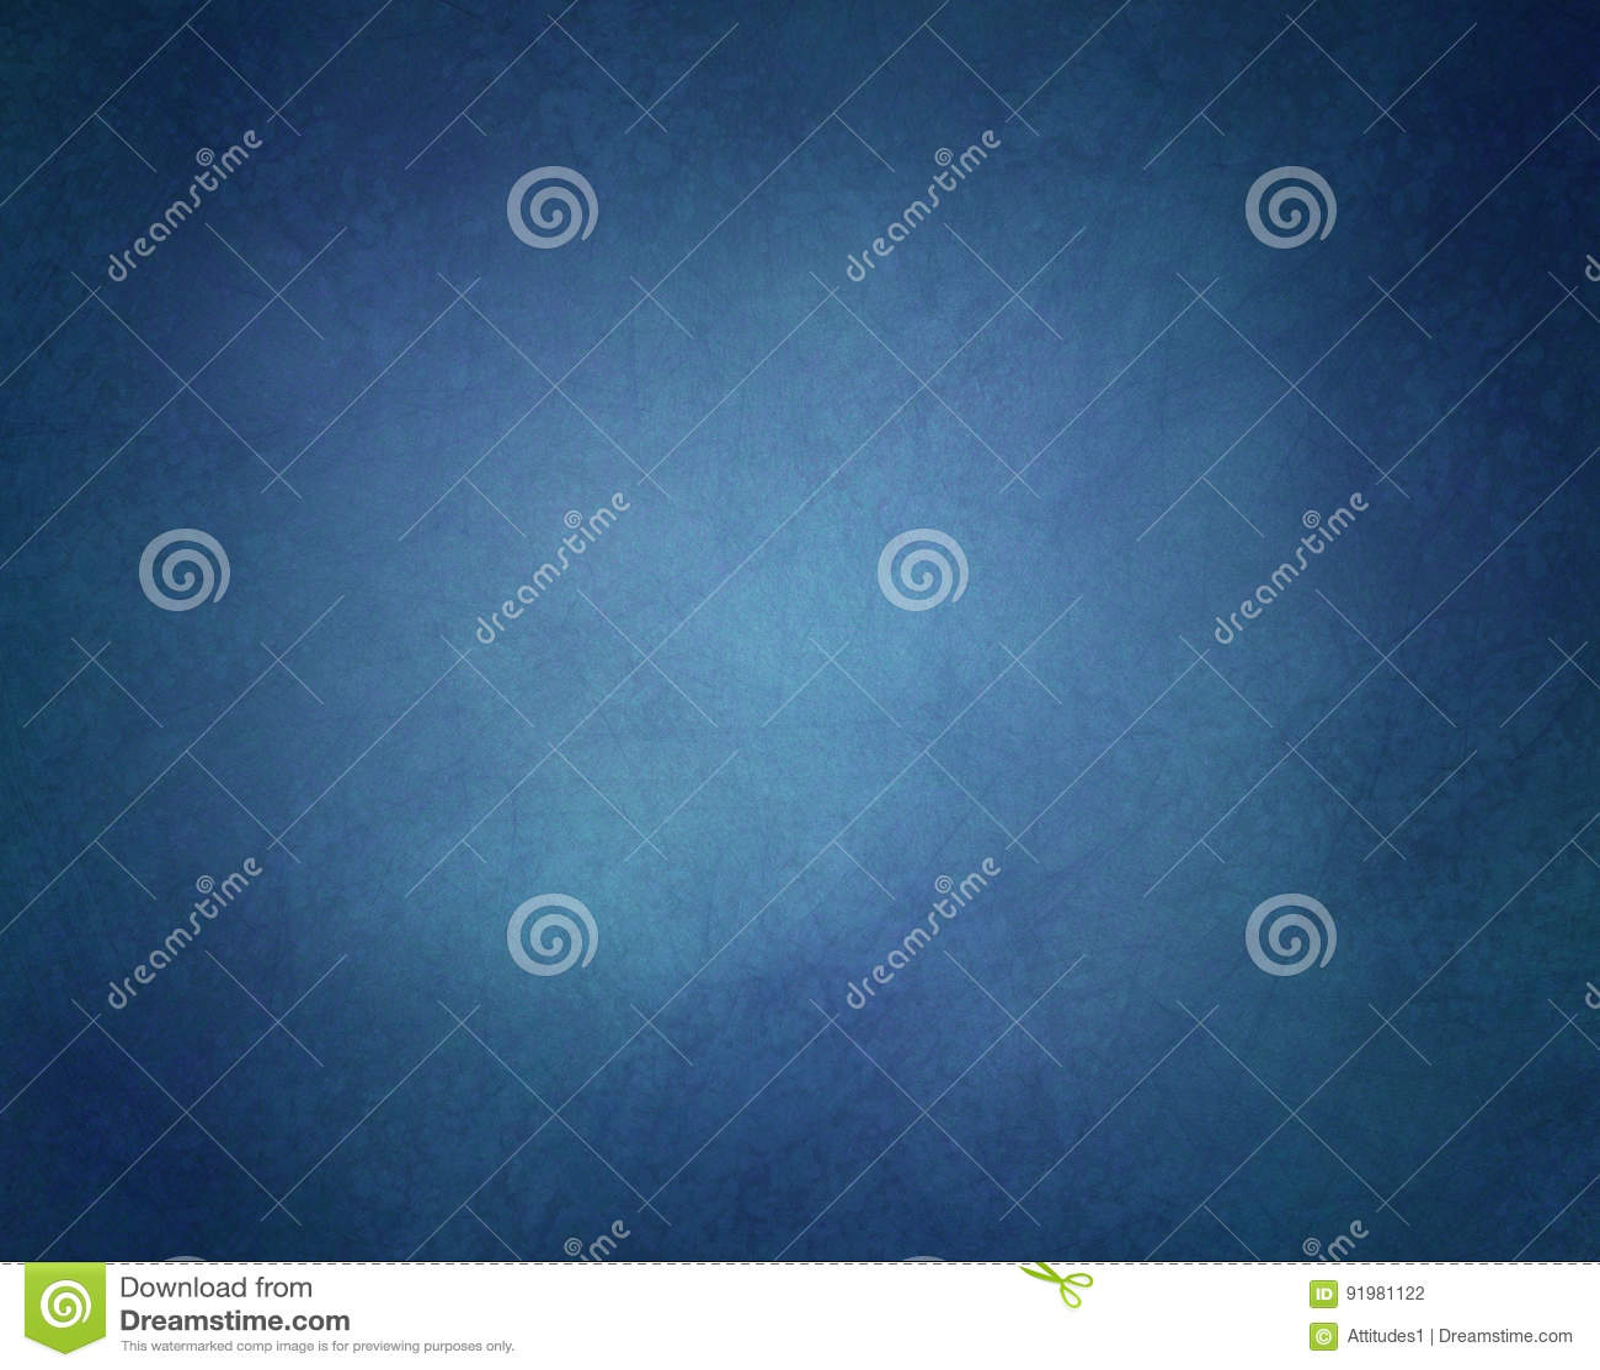 solid blue background with vintage texture and black vignette border